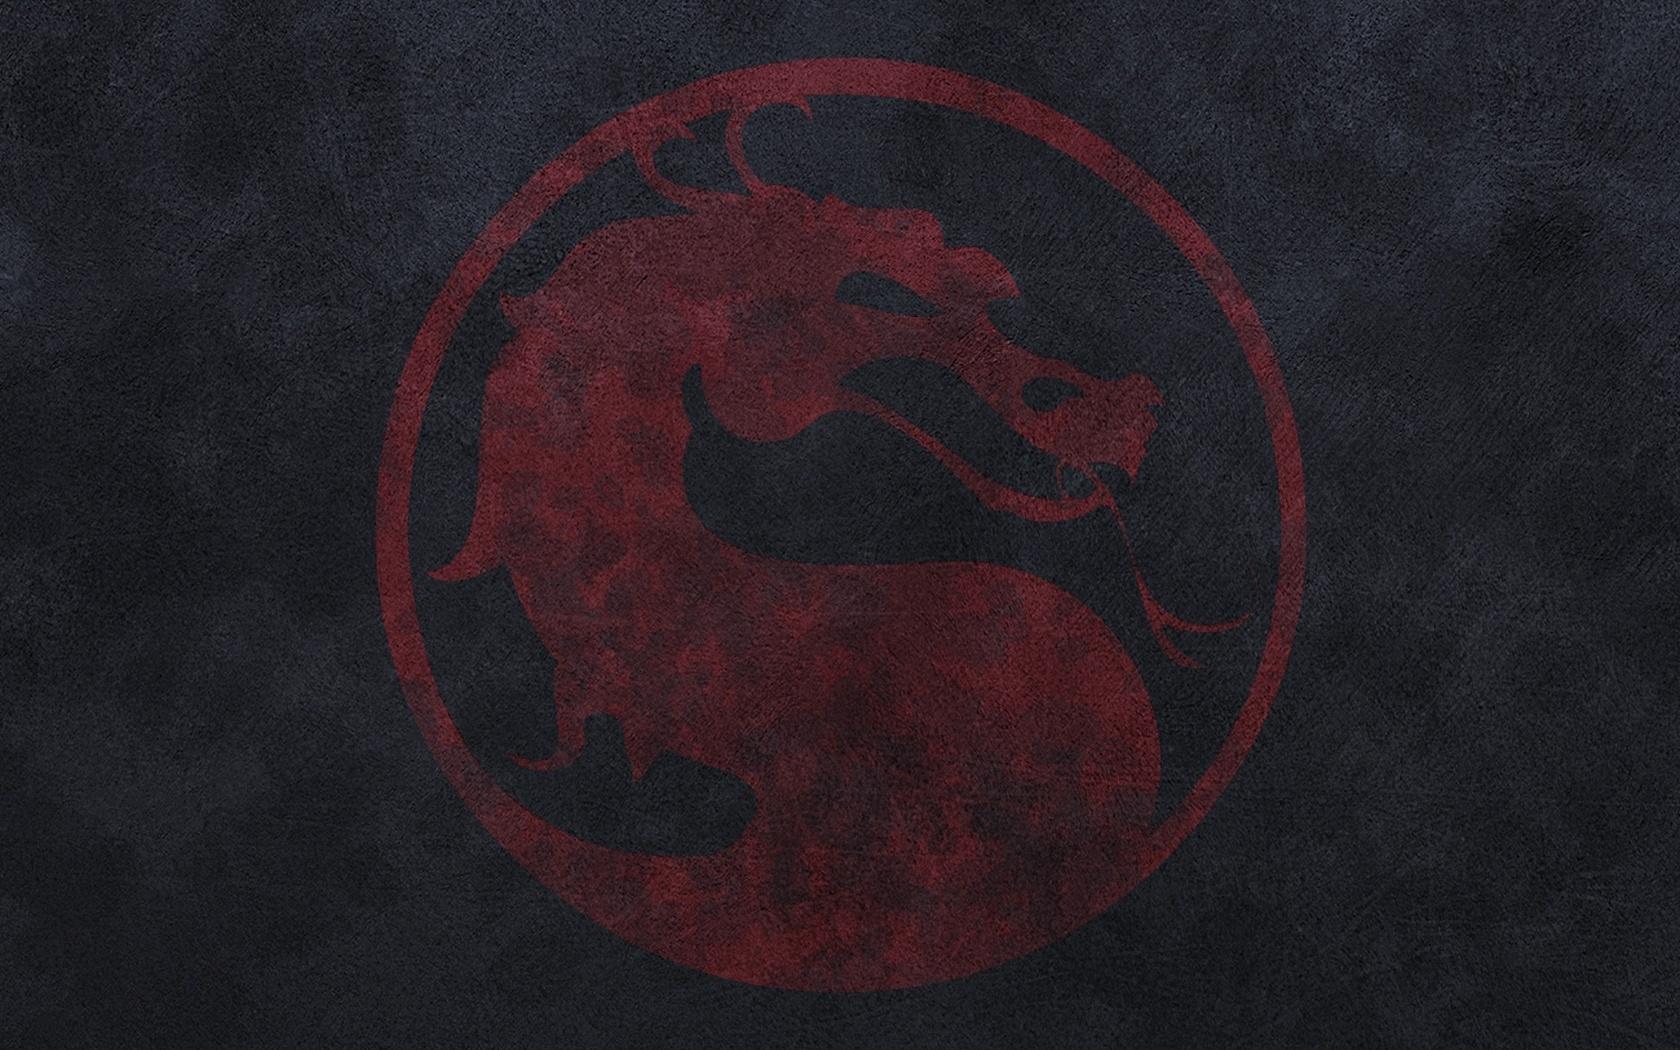 файтинг, значок, дракон, Mortal kombat, рисунки, аниме